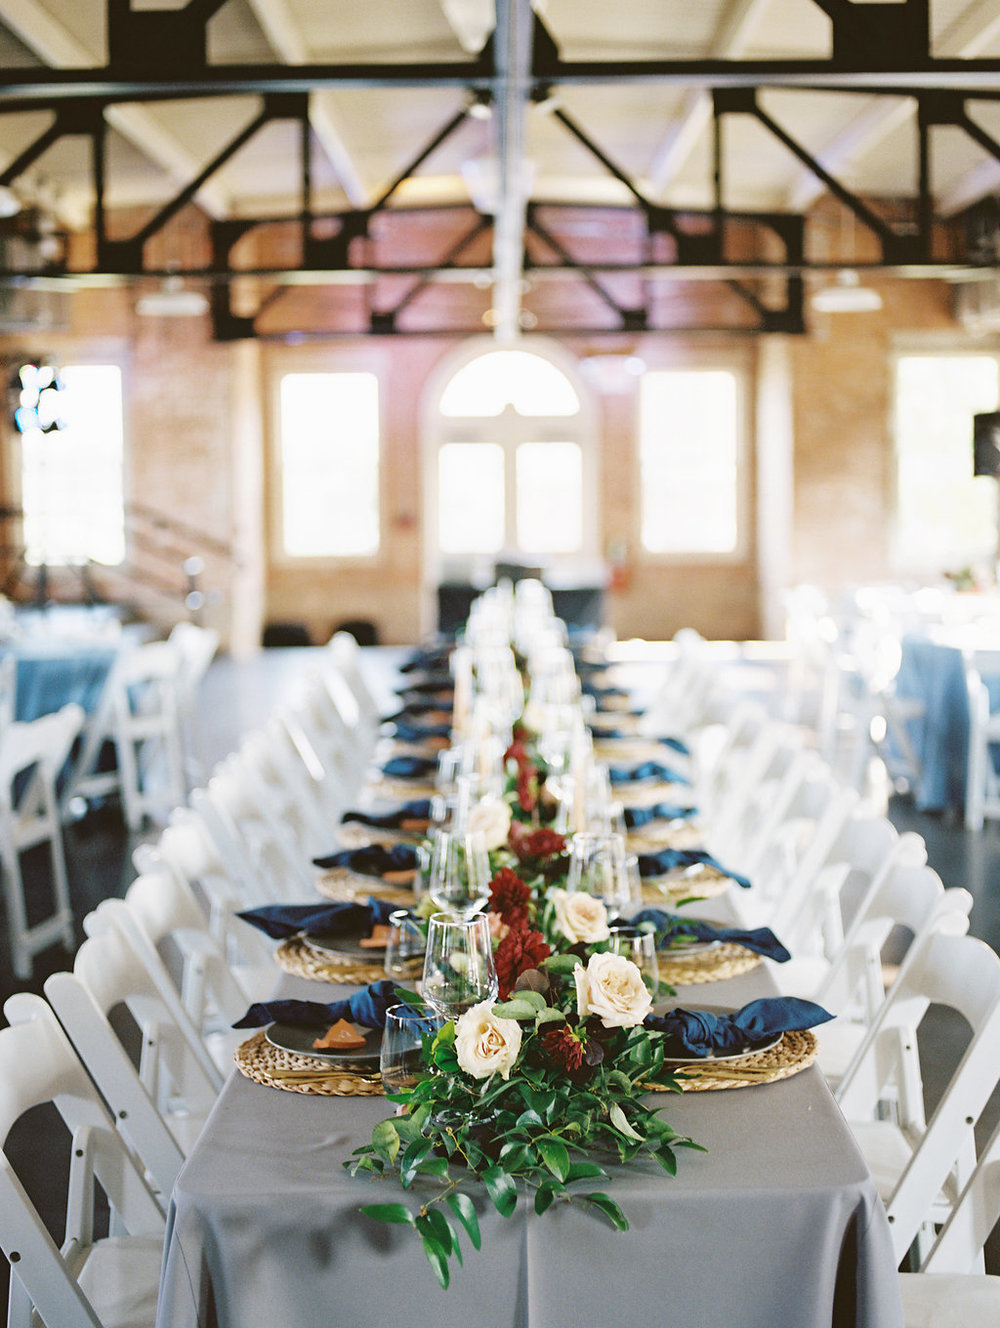 Wedding Flowers Dallas - Garland Wedding Centrepiece